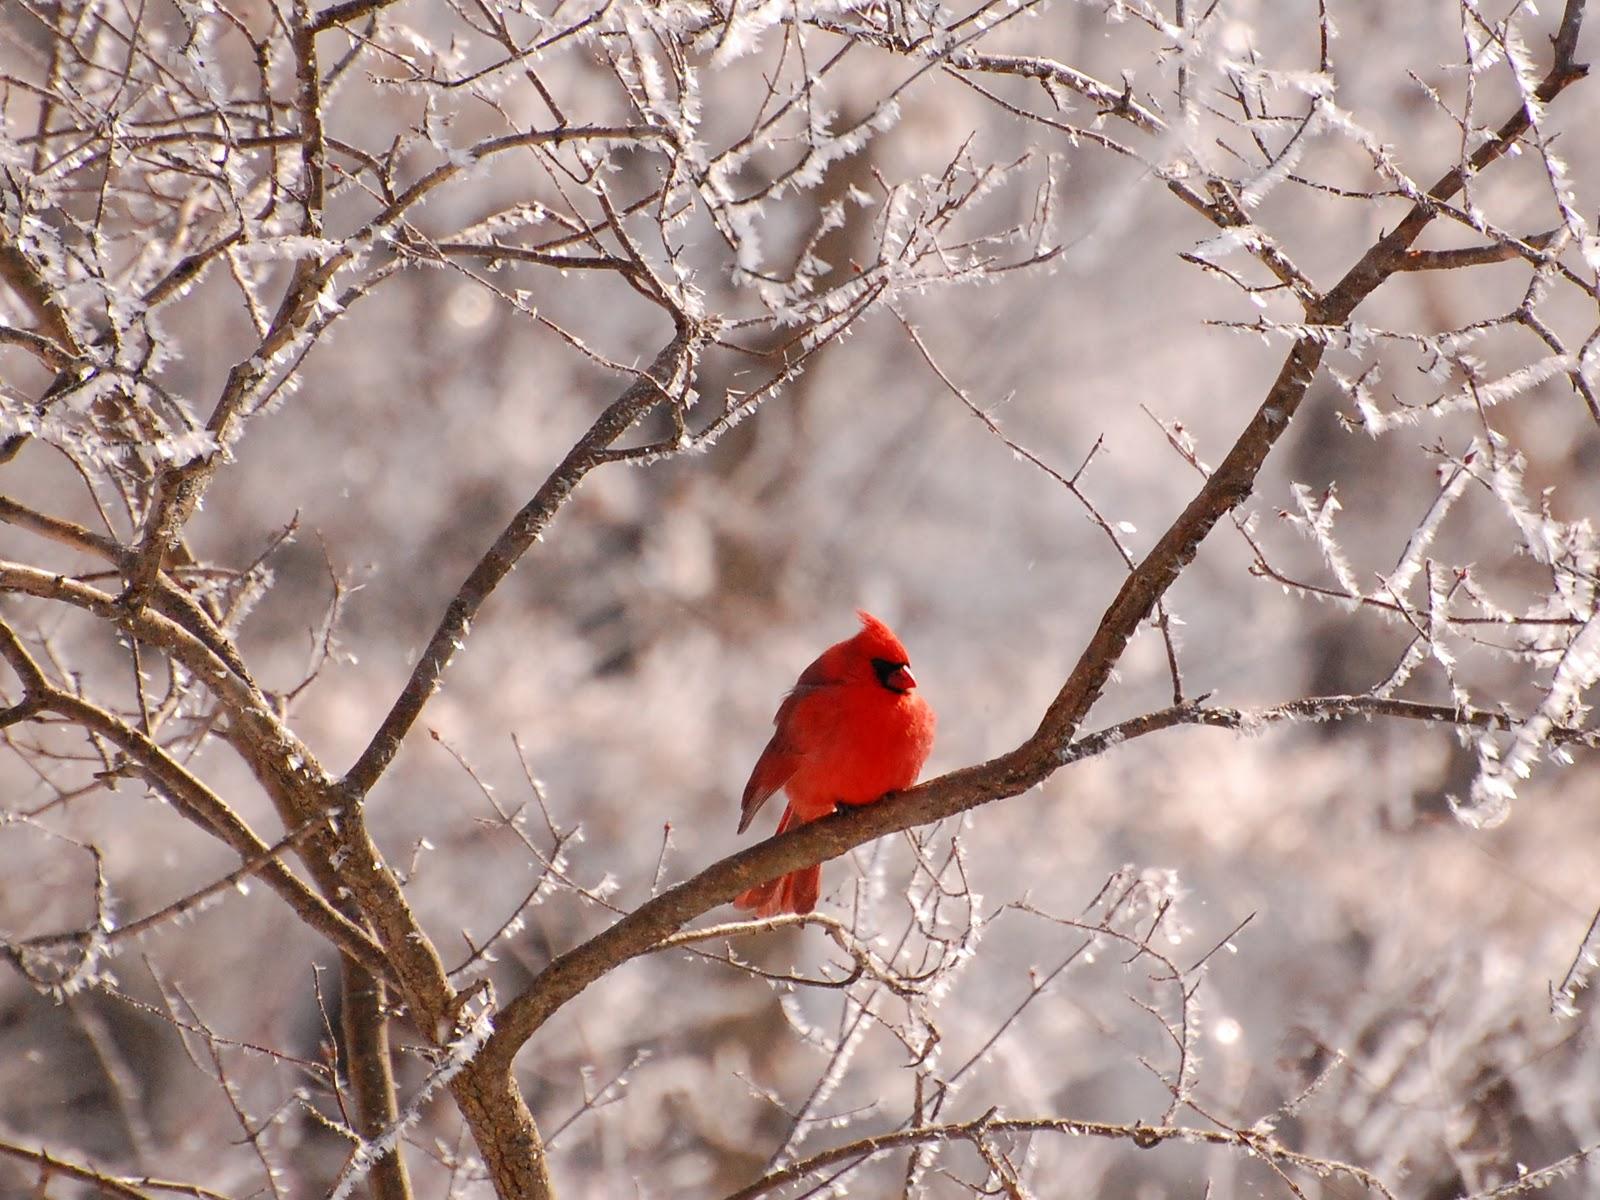 cardinal winter computer wallpaper - photo #30